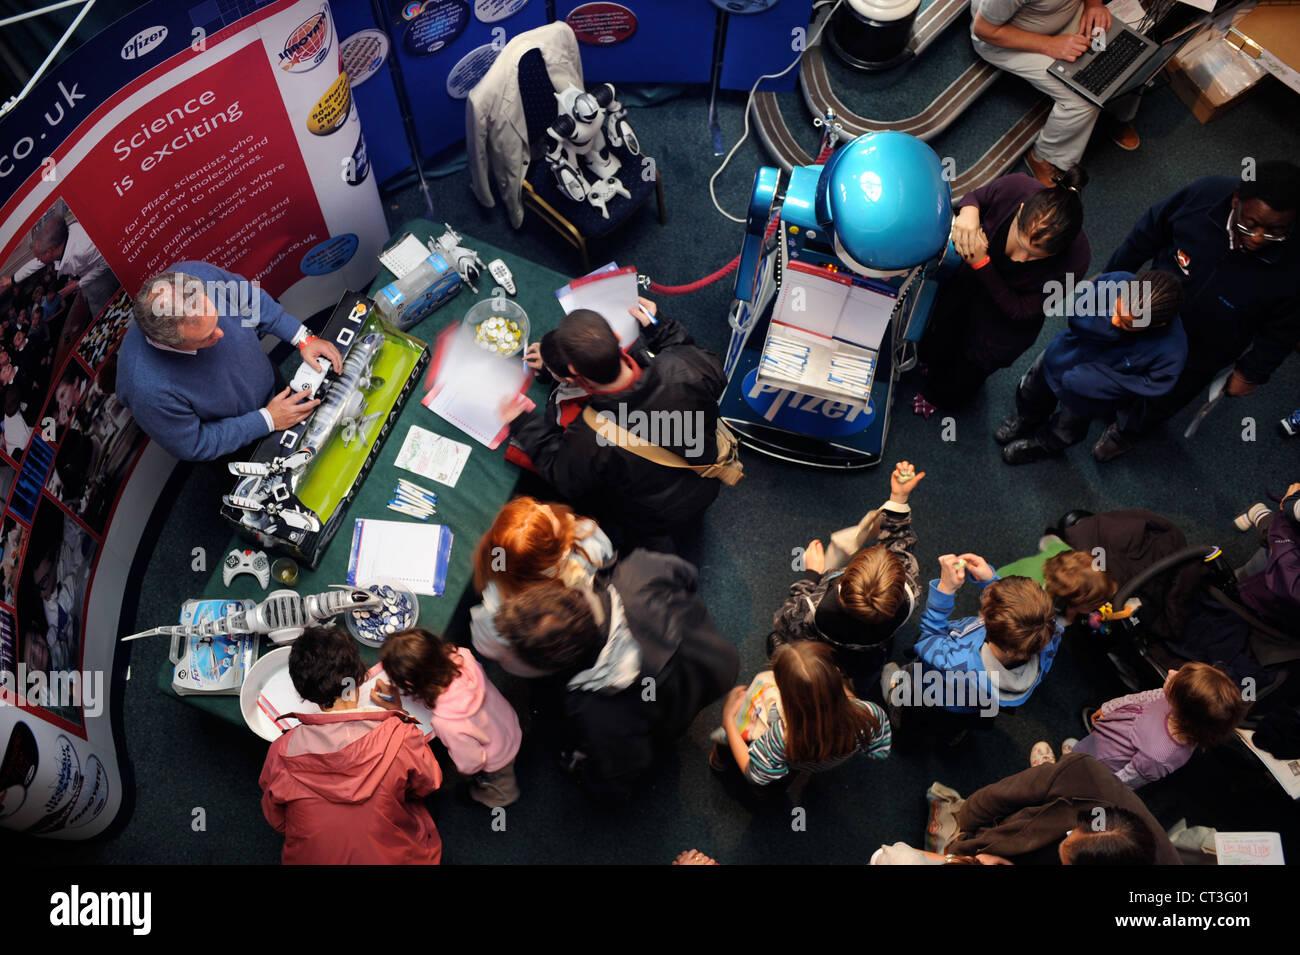 Children meeting a robot at the Cheltenham Science Festival UK - Stock Image